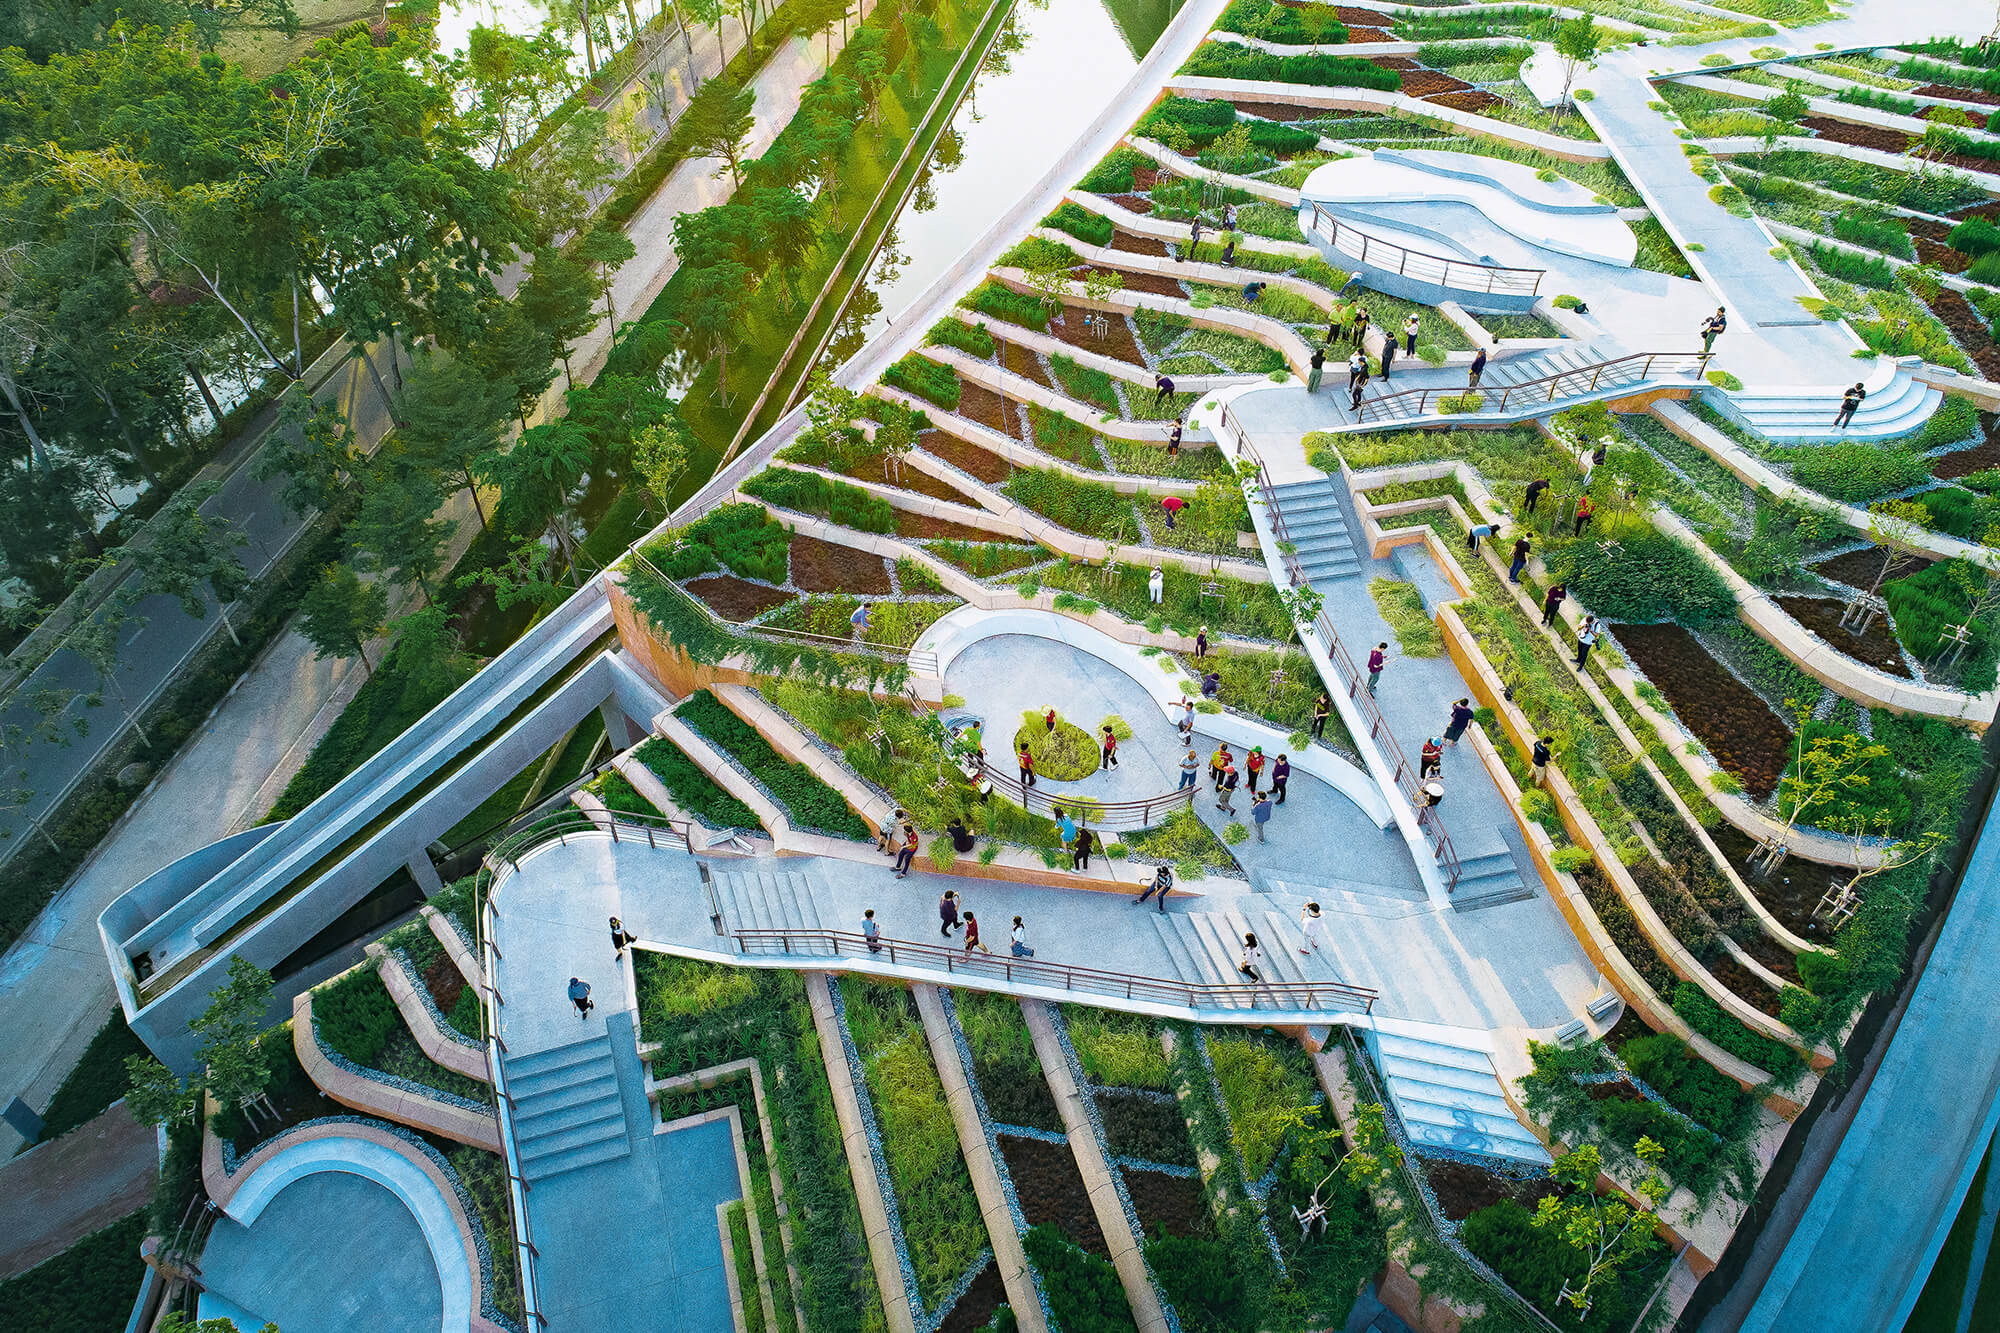 holcim 2021 thammat urban rooftop farm 01